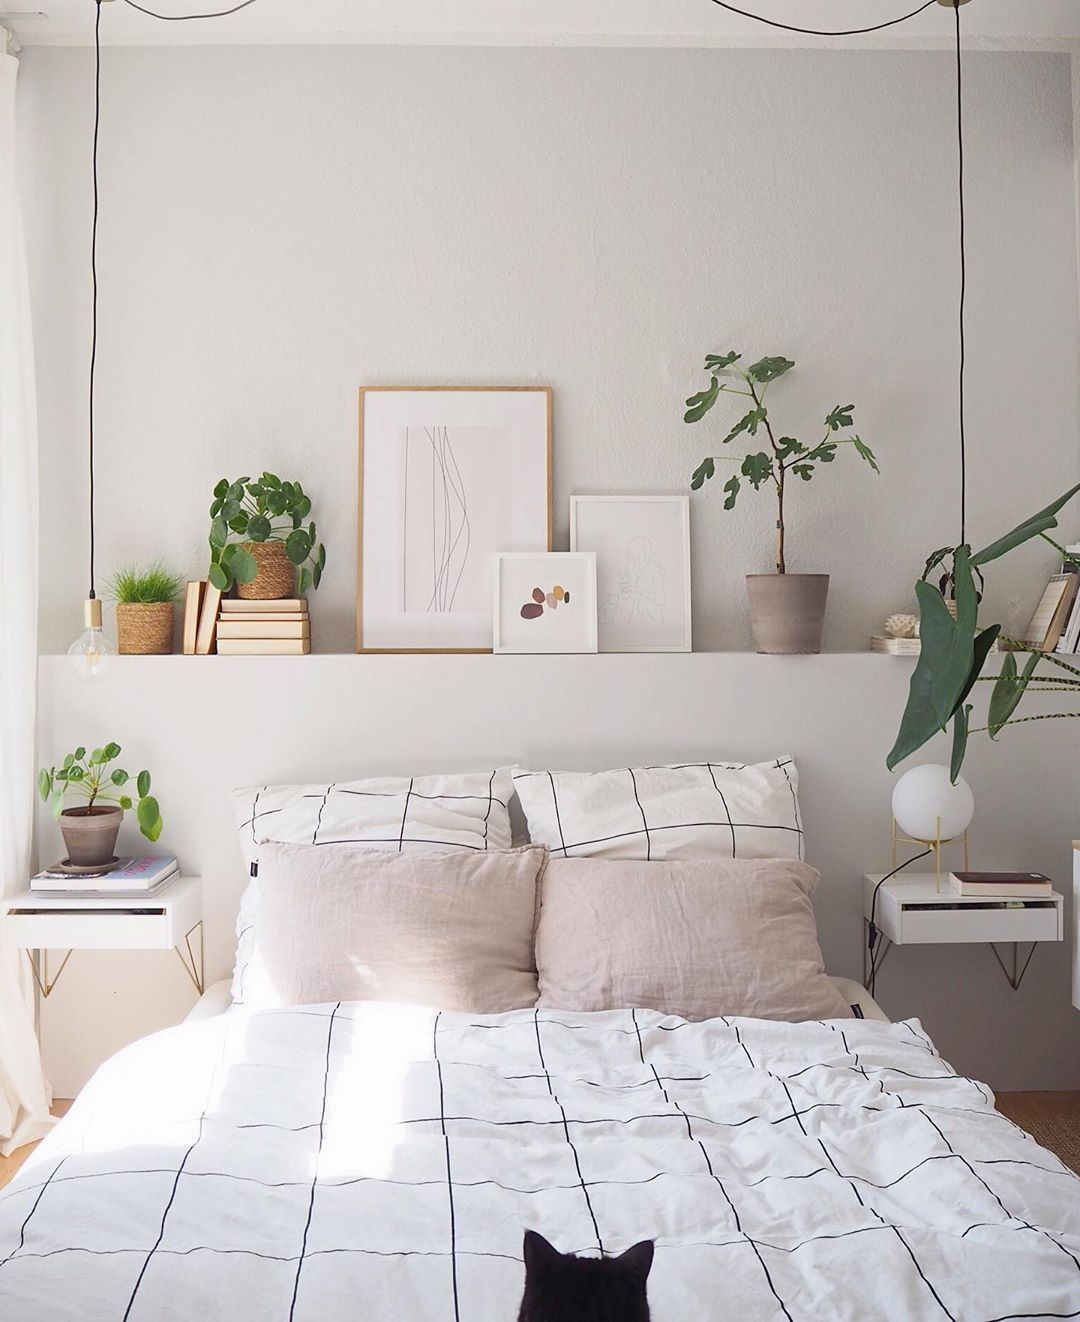 #bedroom decor paintings #bedroom decor xmas #bedroom decor magazine #themes for… - My Diy Home Decor Blog